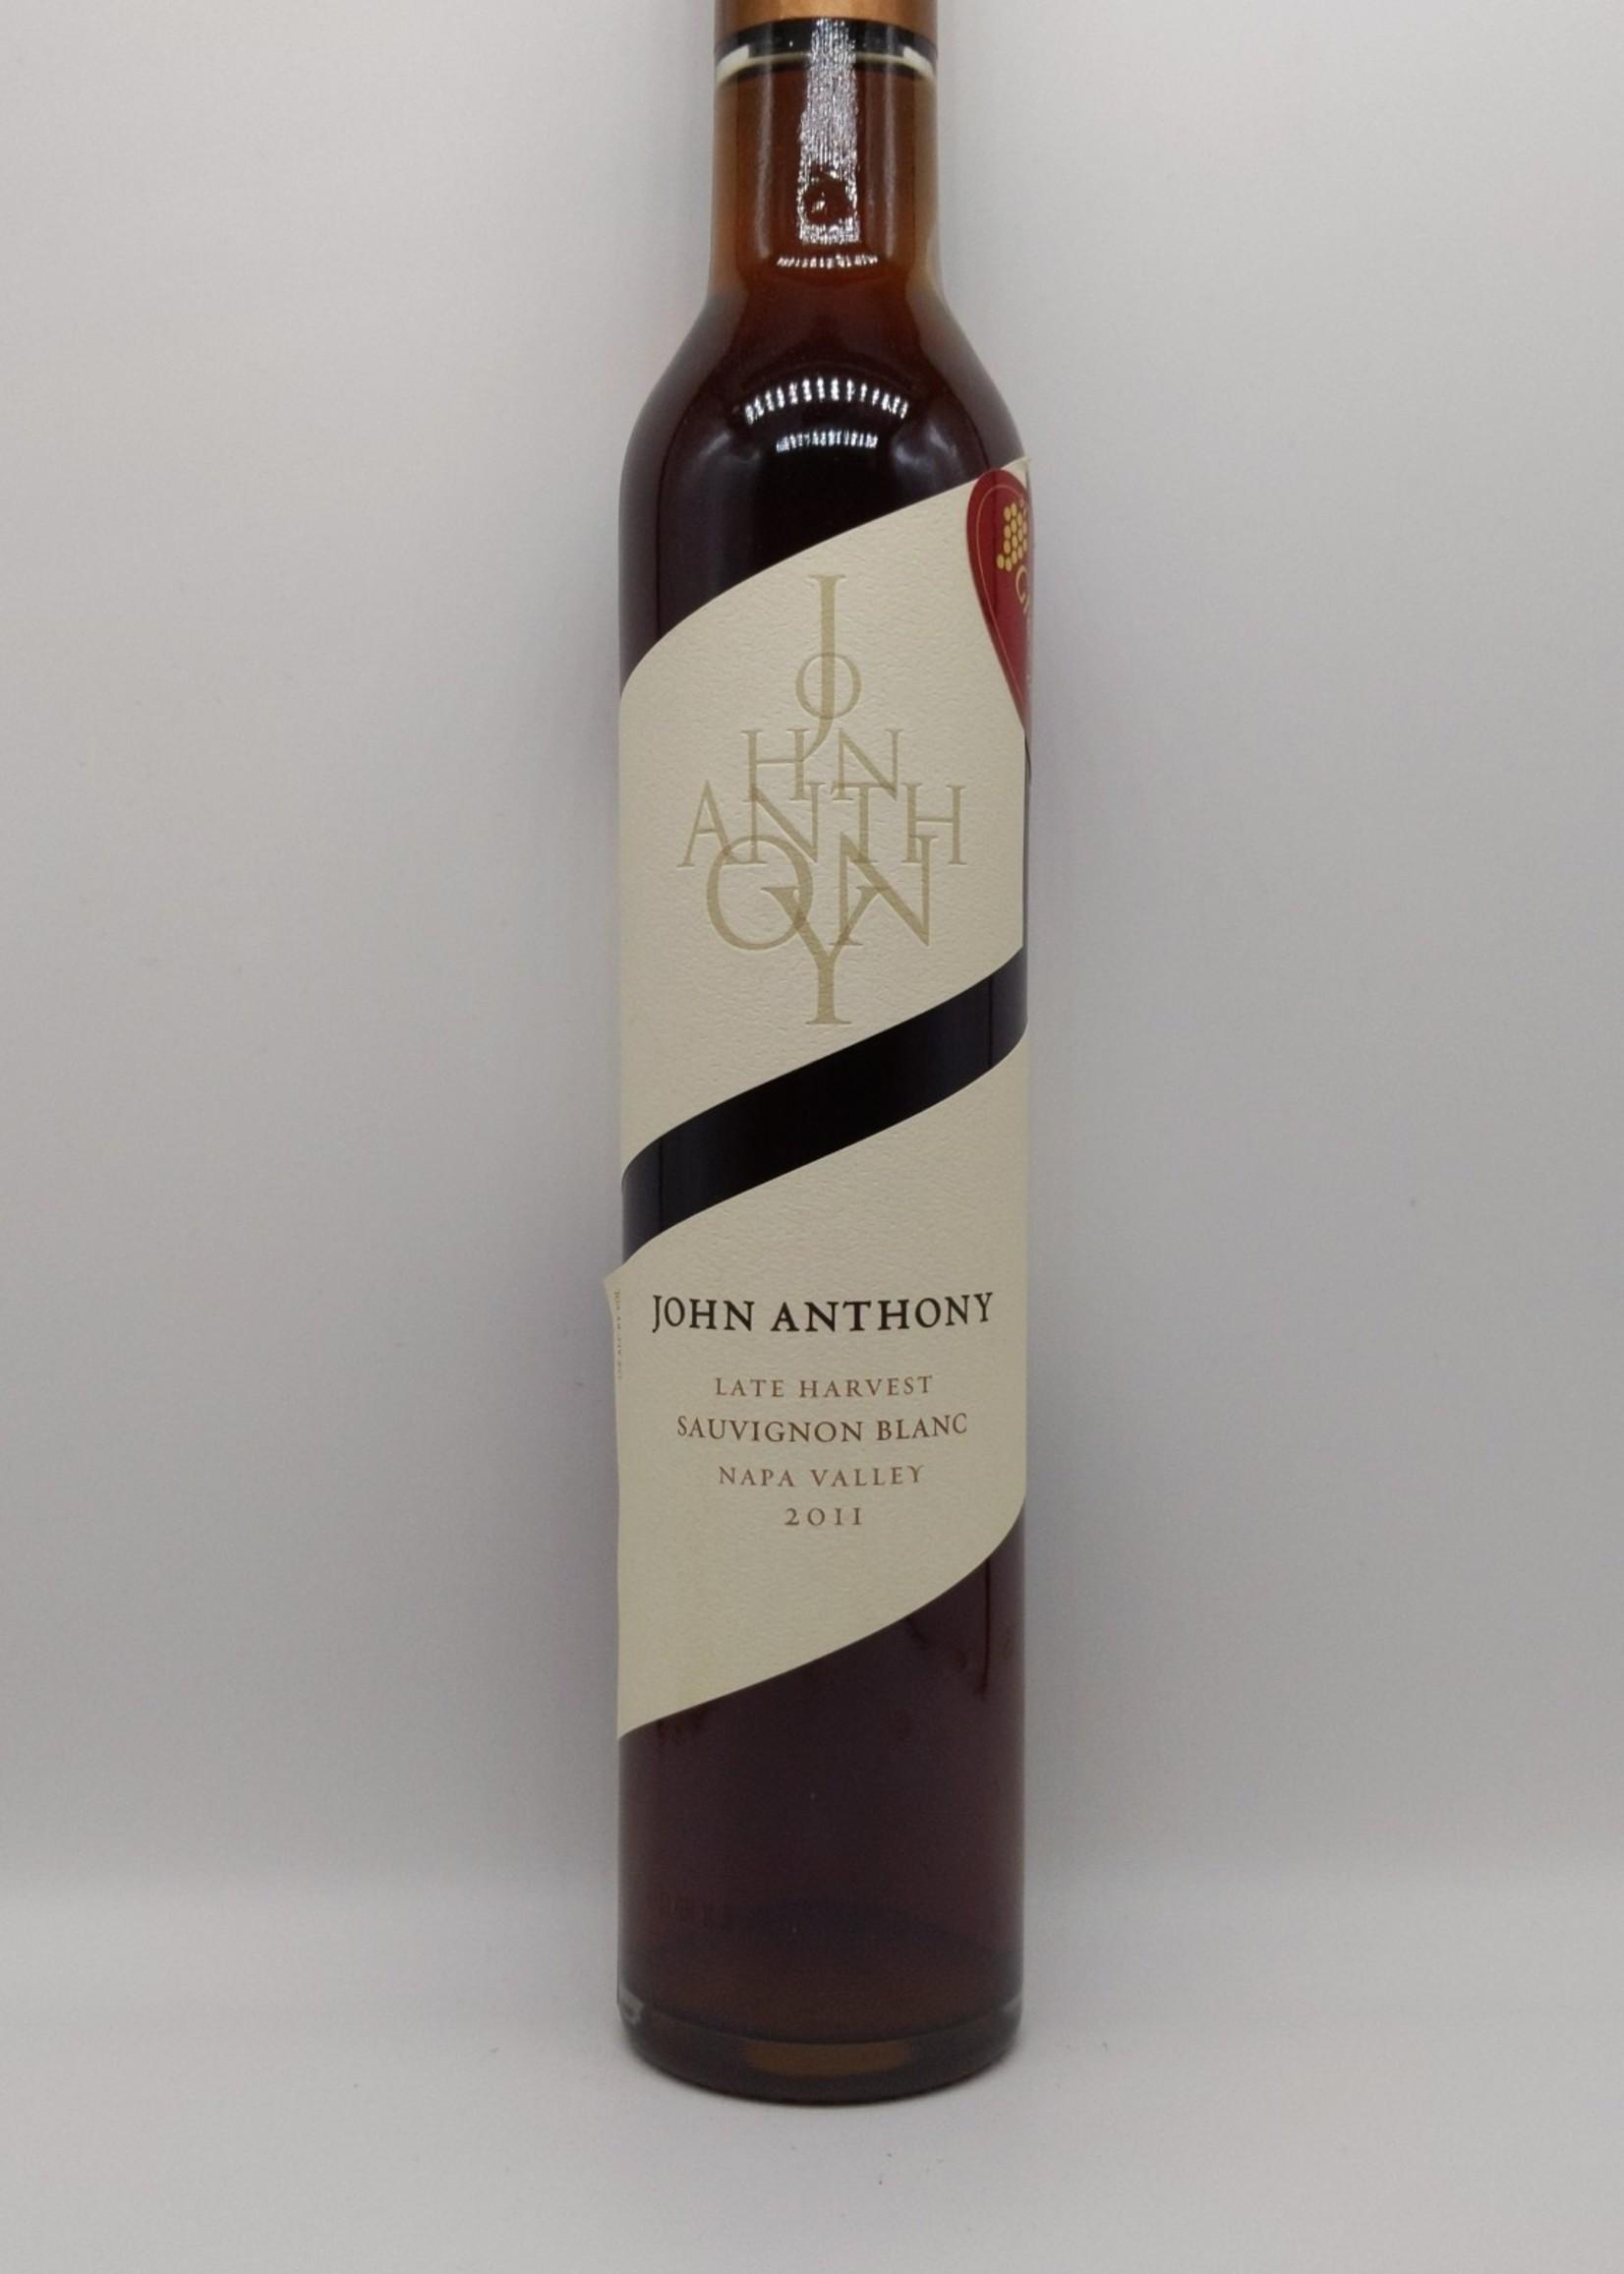 2011 JOHN ANTHONY LATE HARVEST SAUVIGNON BLANC 375ml